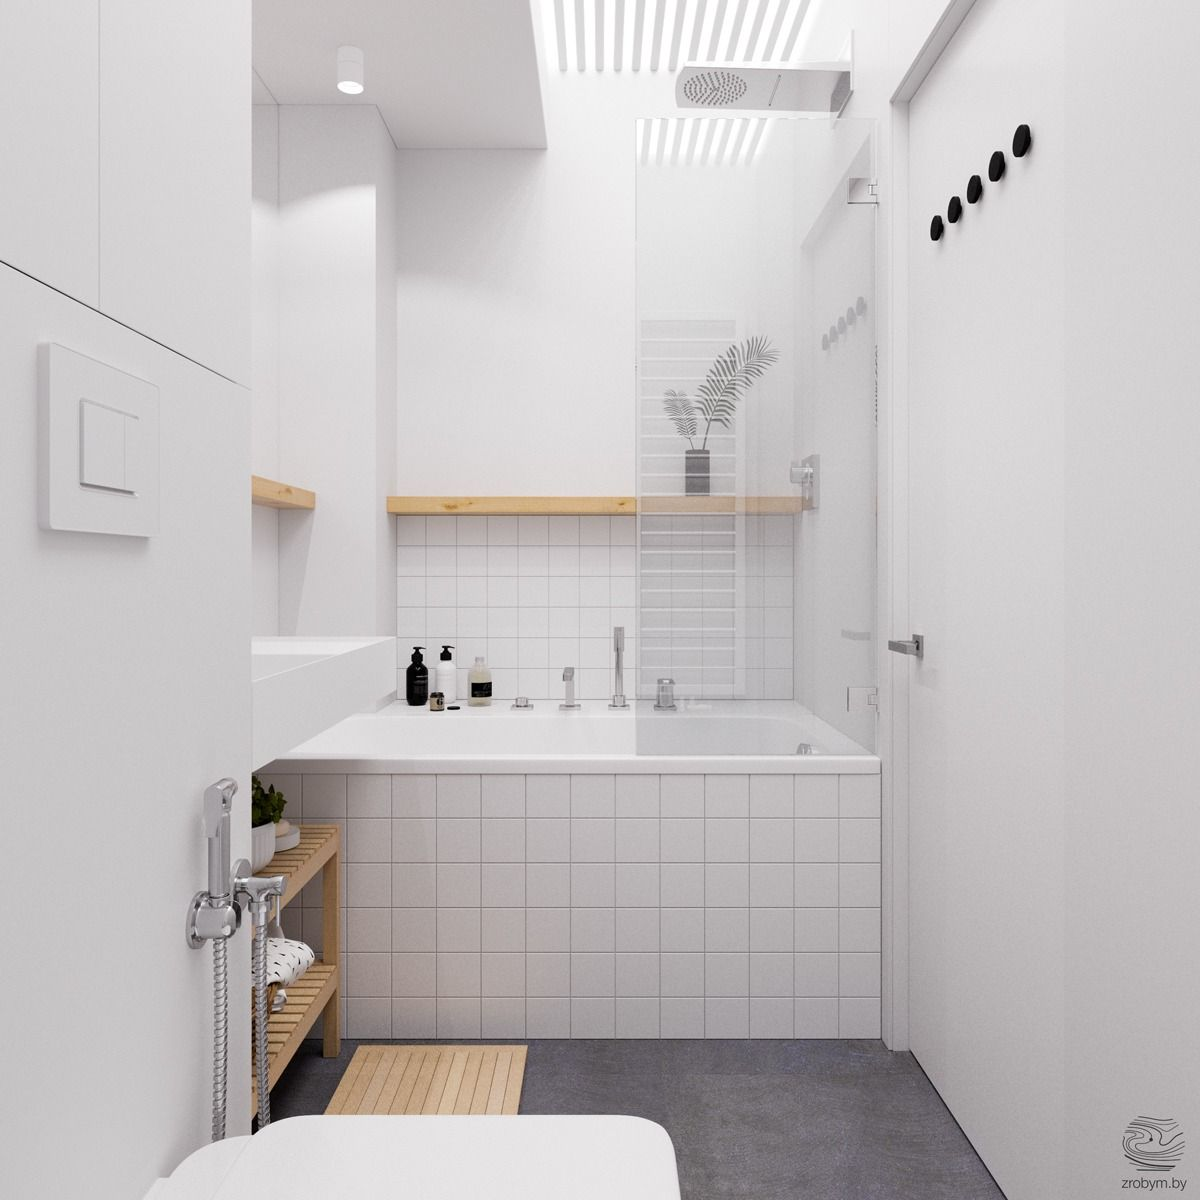 A Beautiful 3 Bedroom 2 Bath House [With Floor Plan